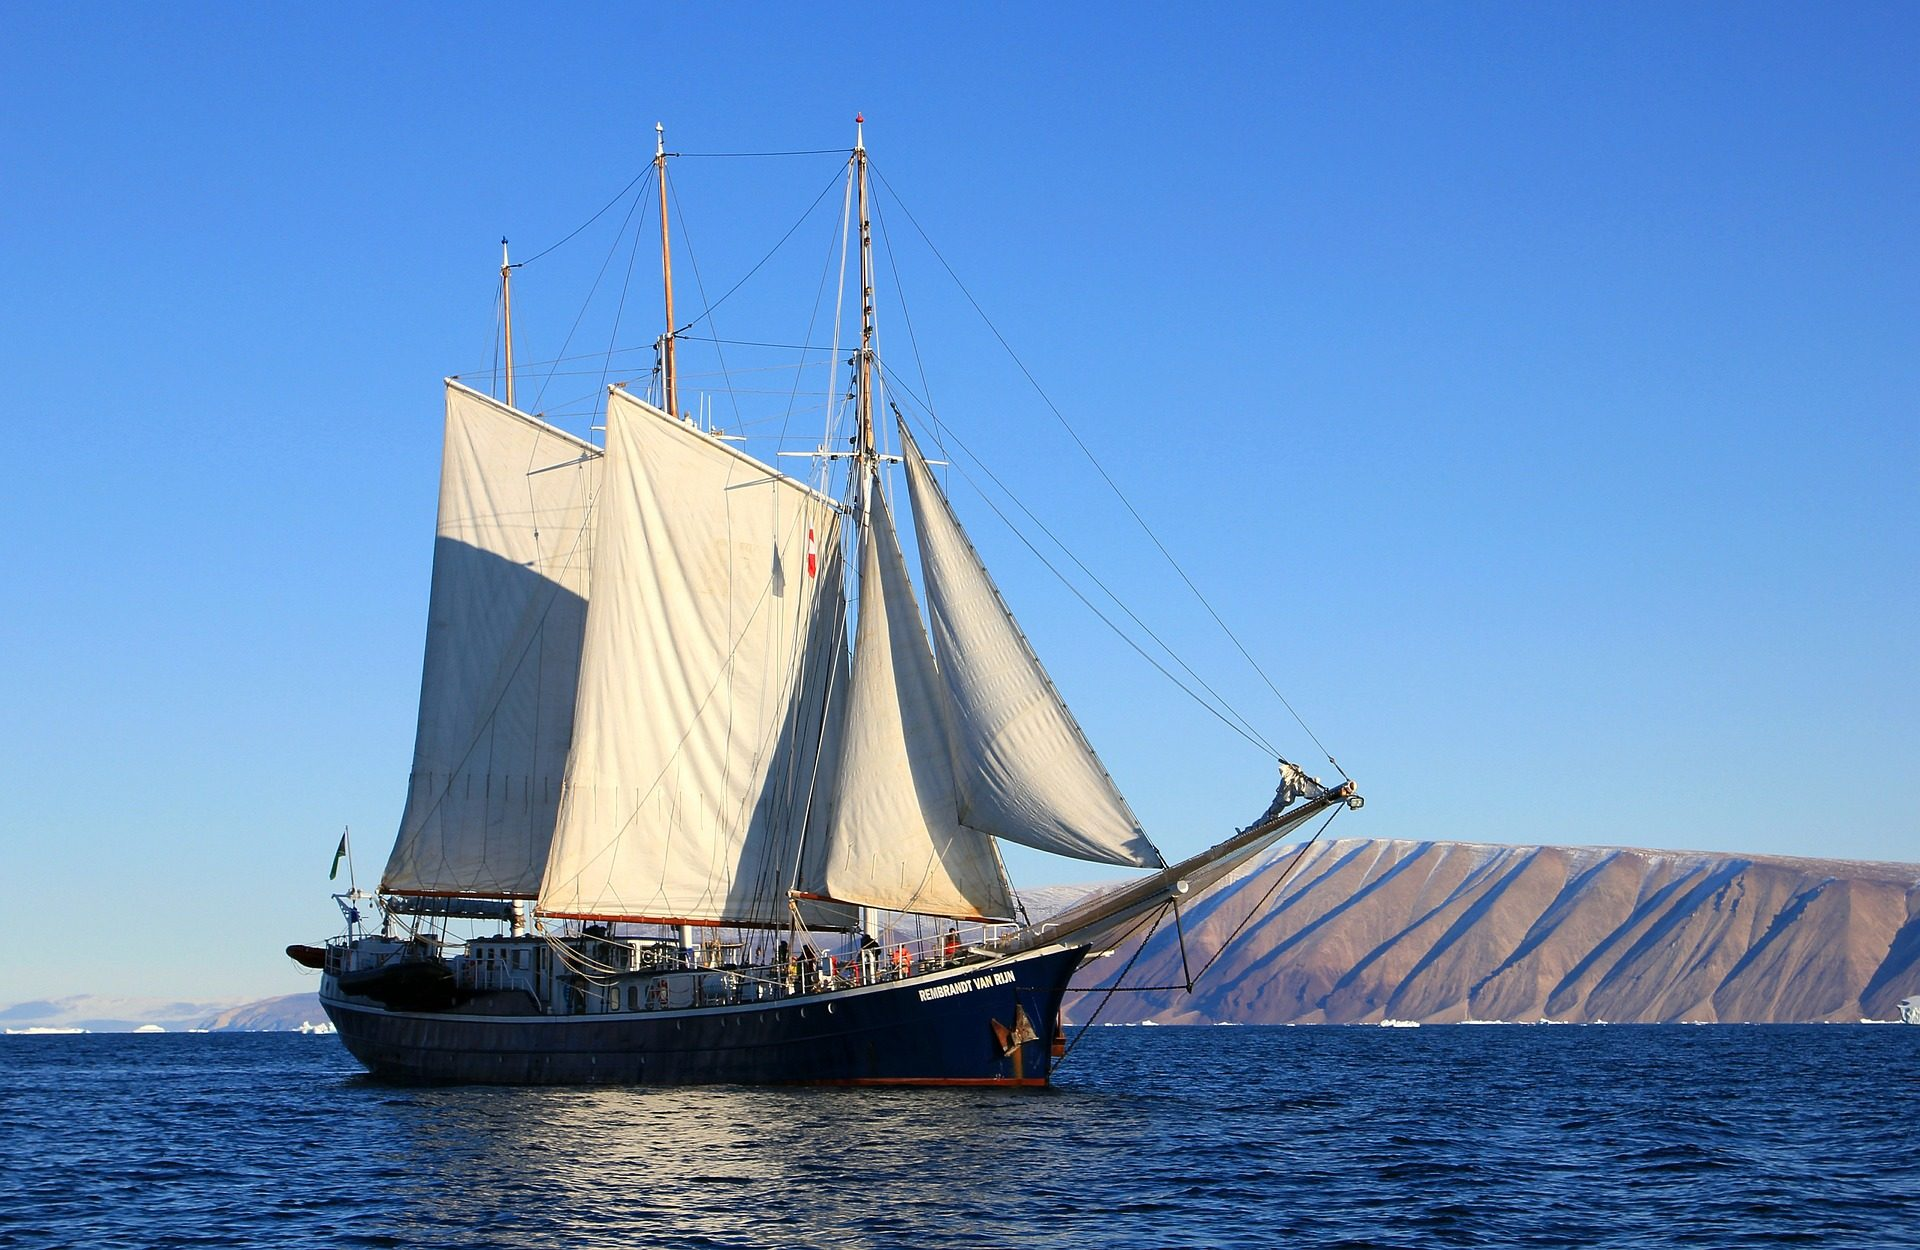 velero, 小船, navío, 海洋, 海 - 高清壁纸 - 教授-falken.com